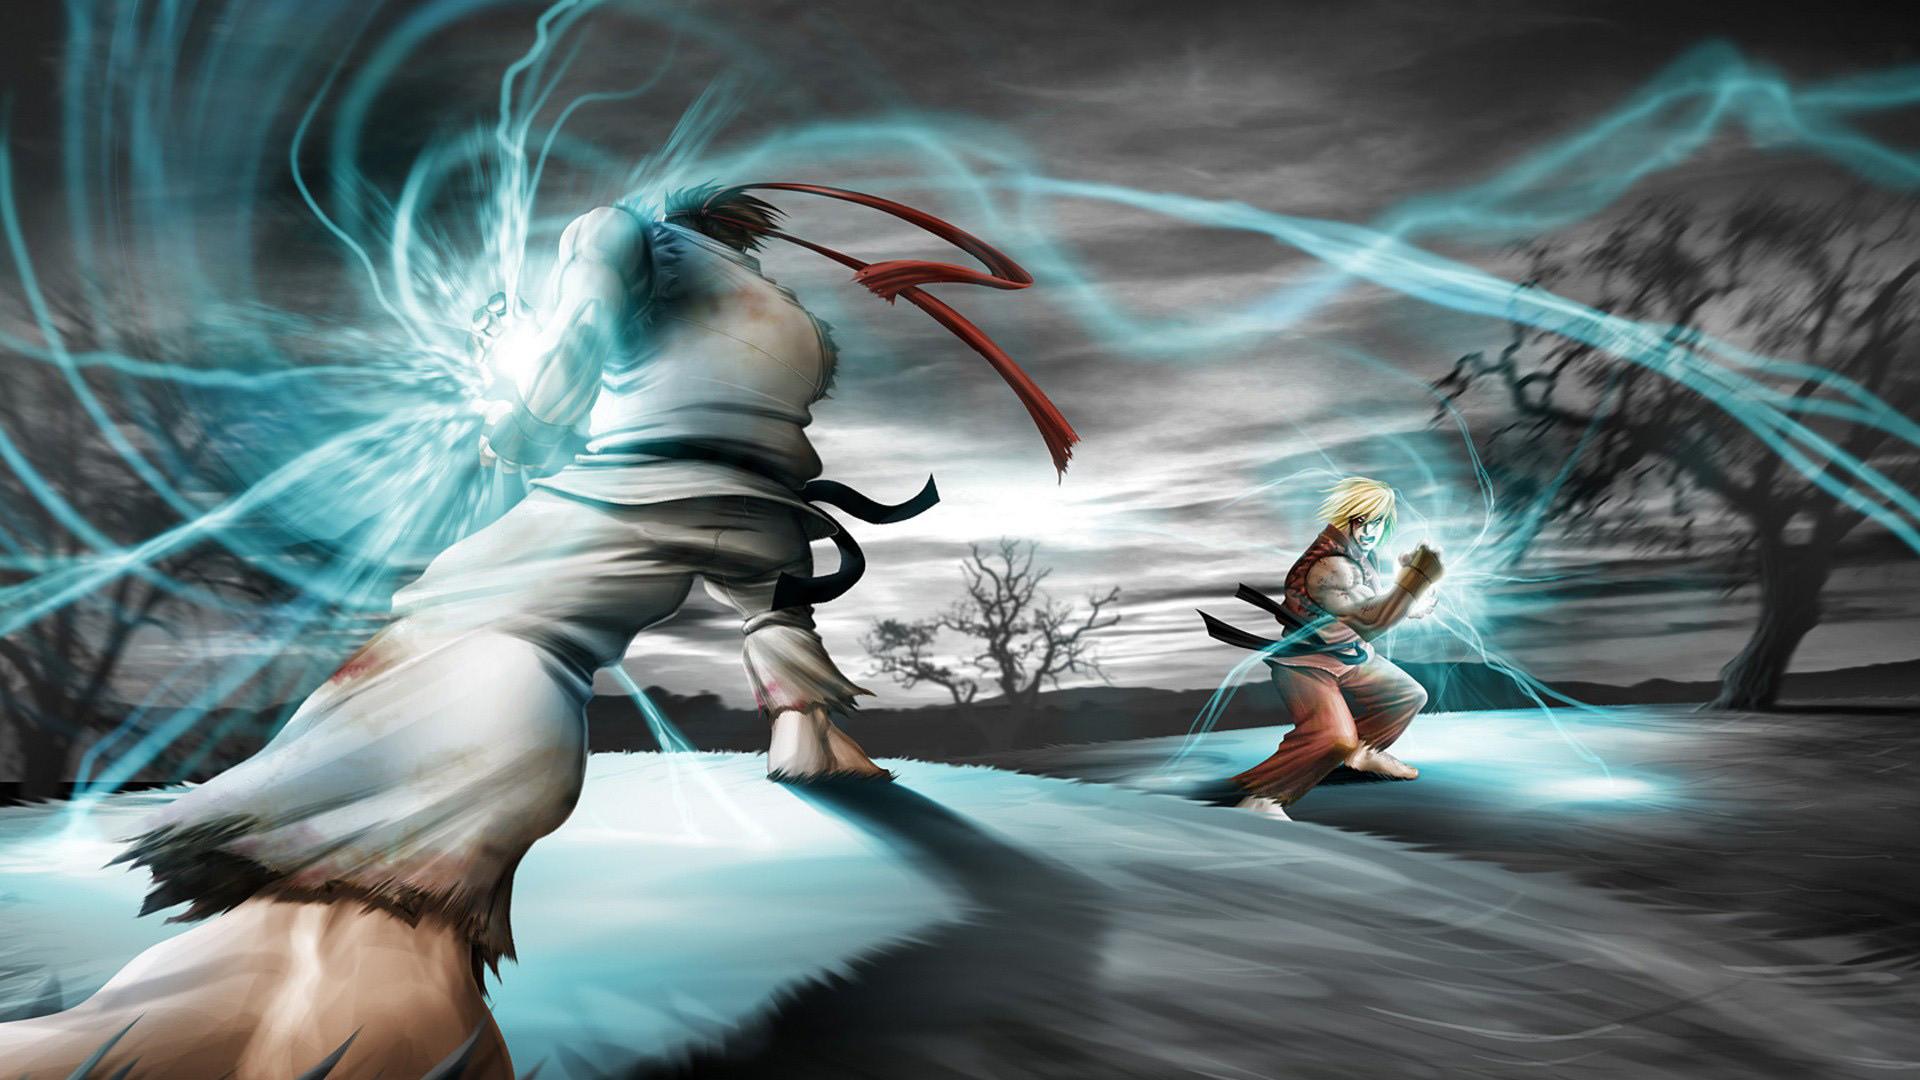 Street Fighter Wallpaper Hd